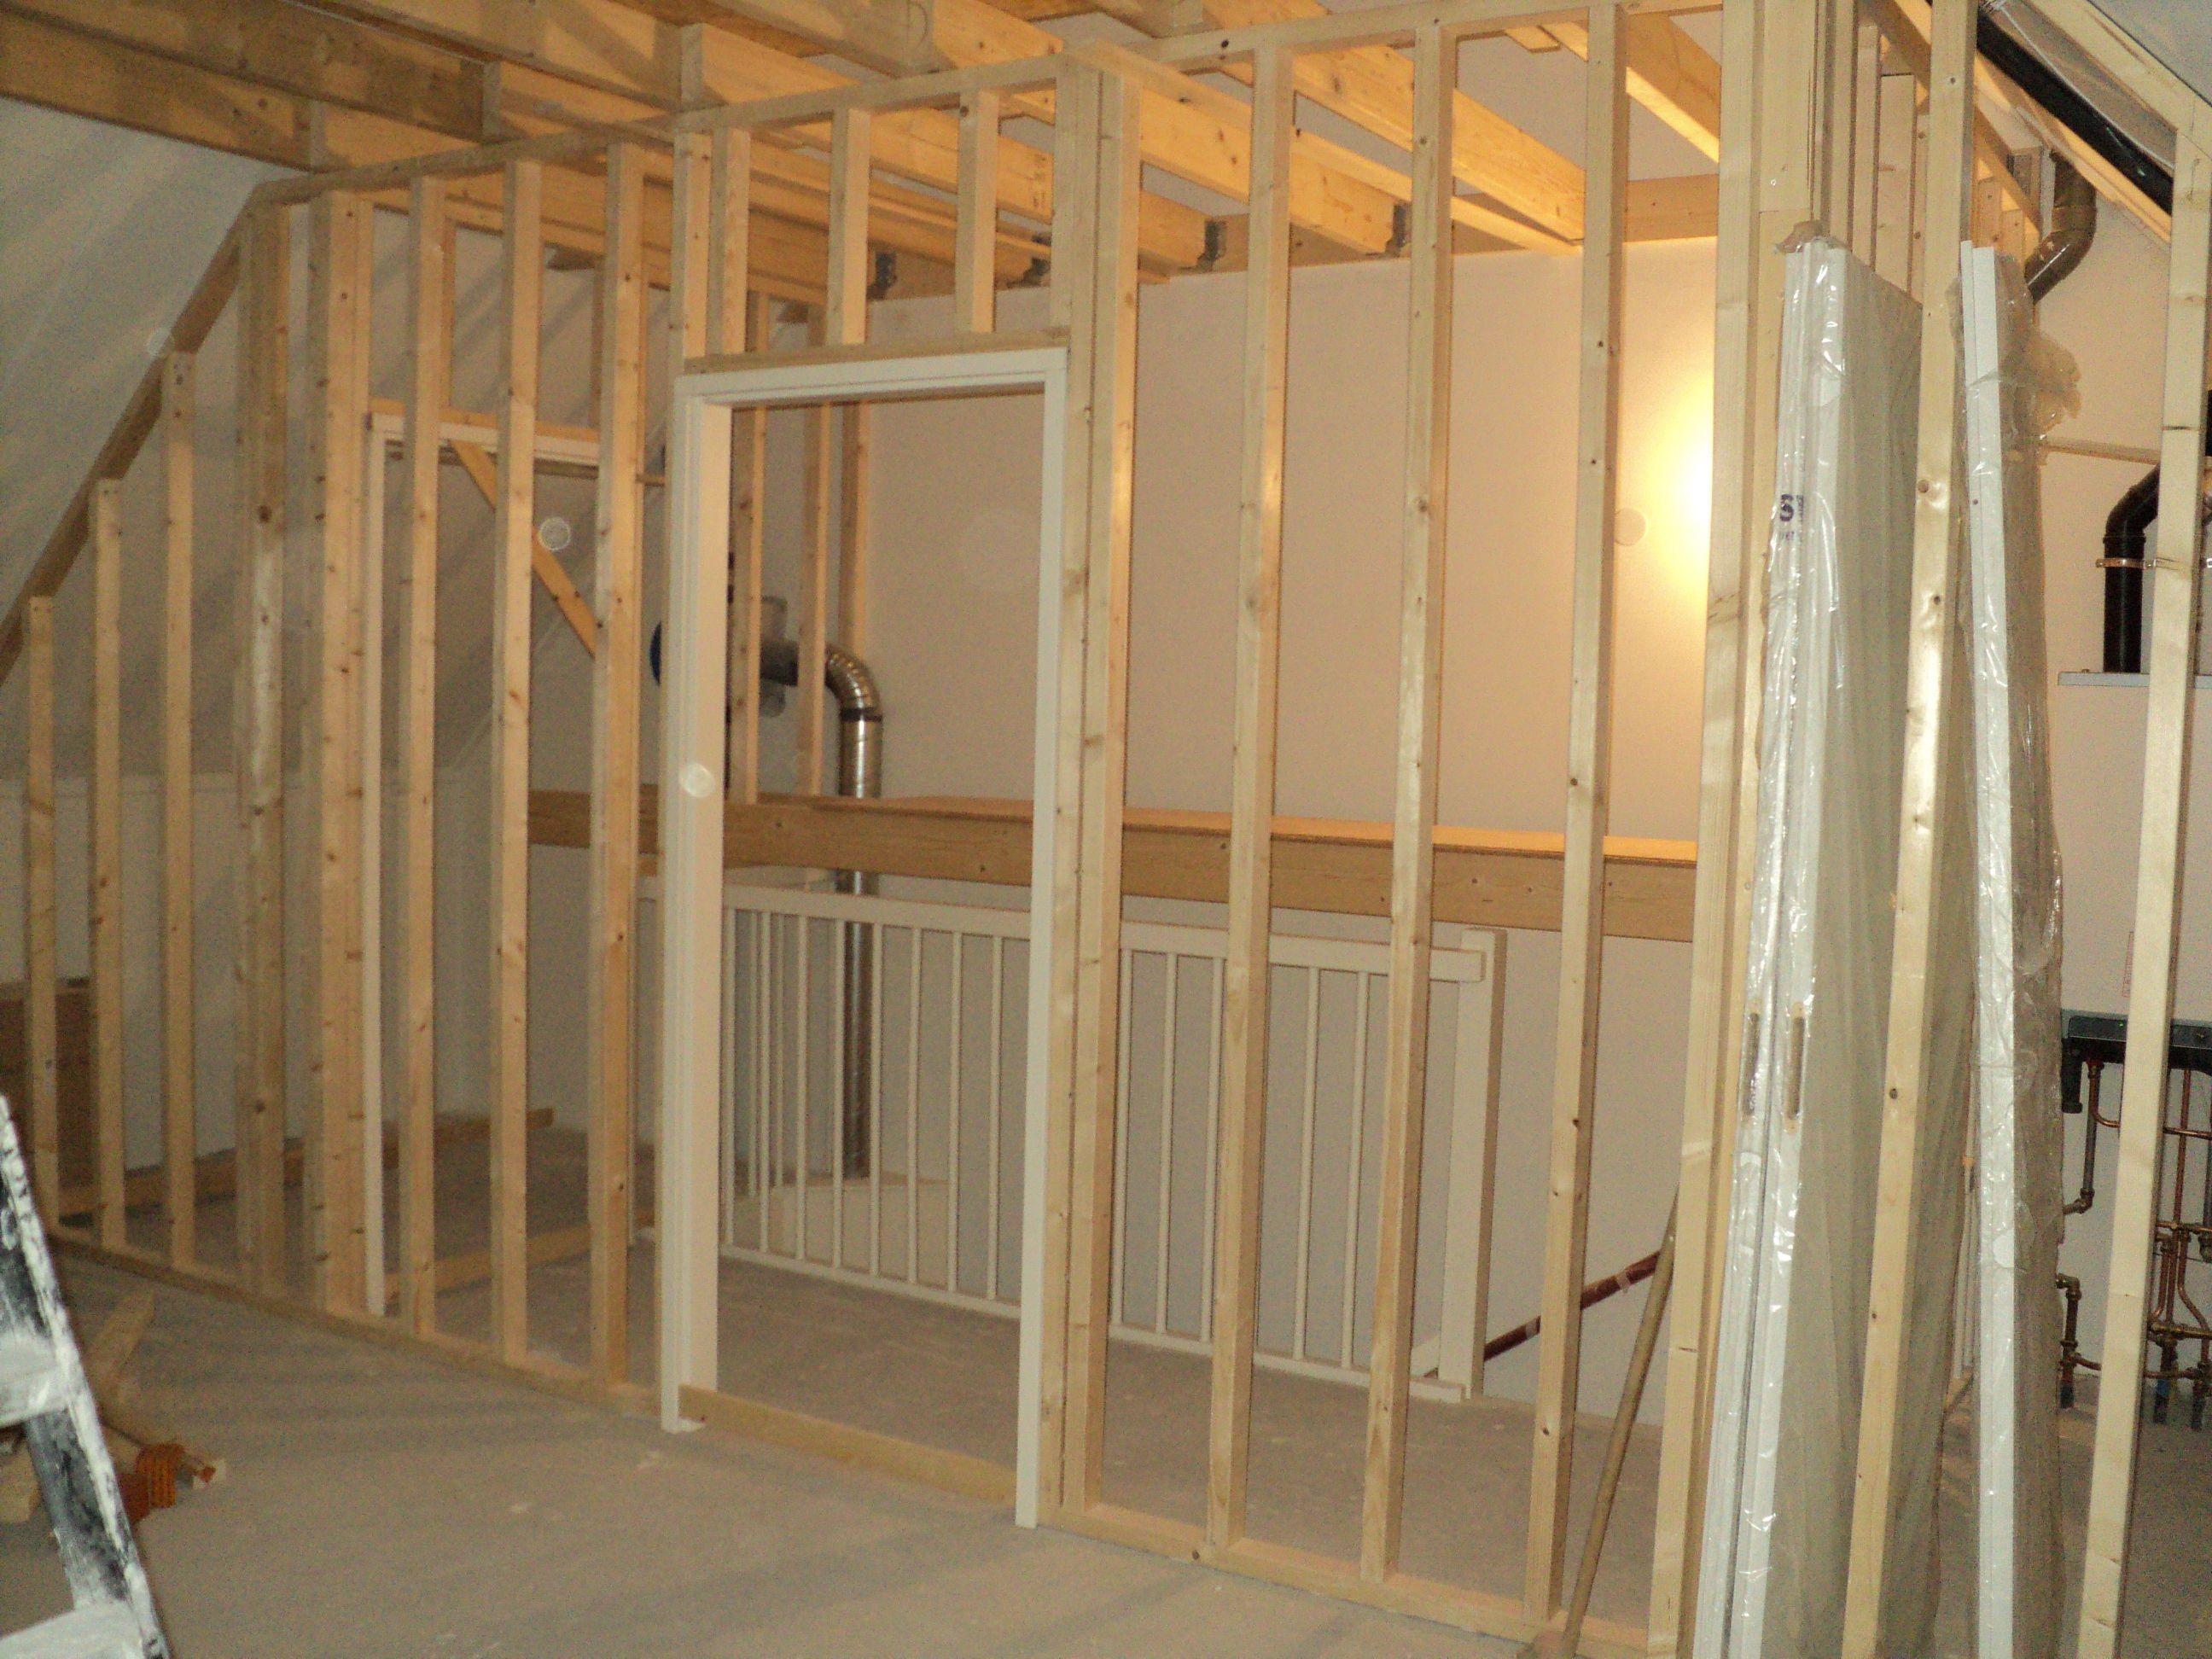 De aker timmerwerken nieuwbouwhuis pinterest zolder for Trapgat maken